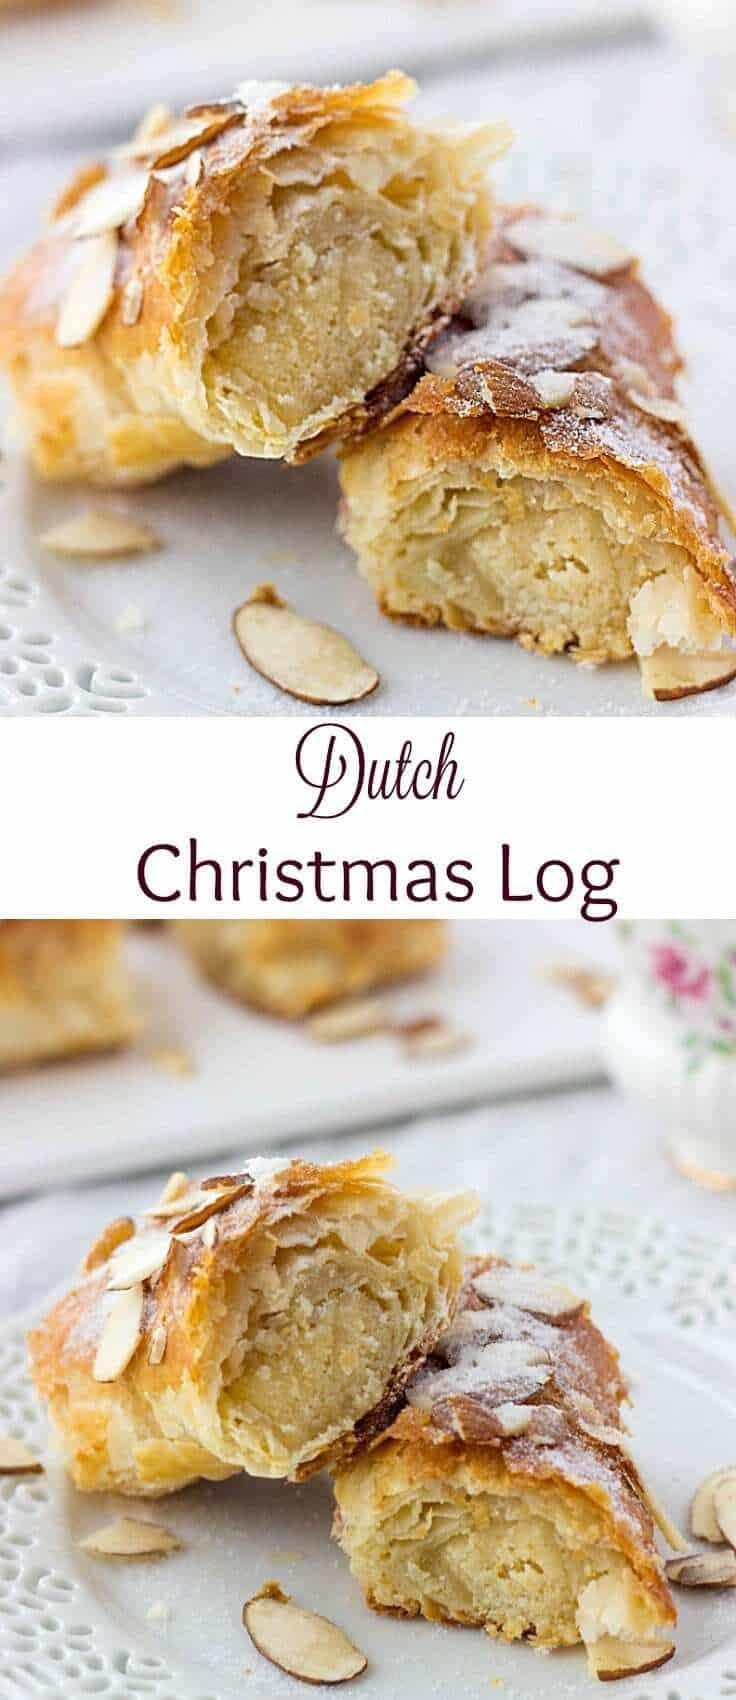 Pinterest Image of Dutch Banket dessert